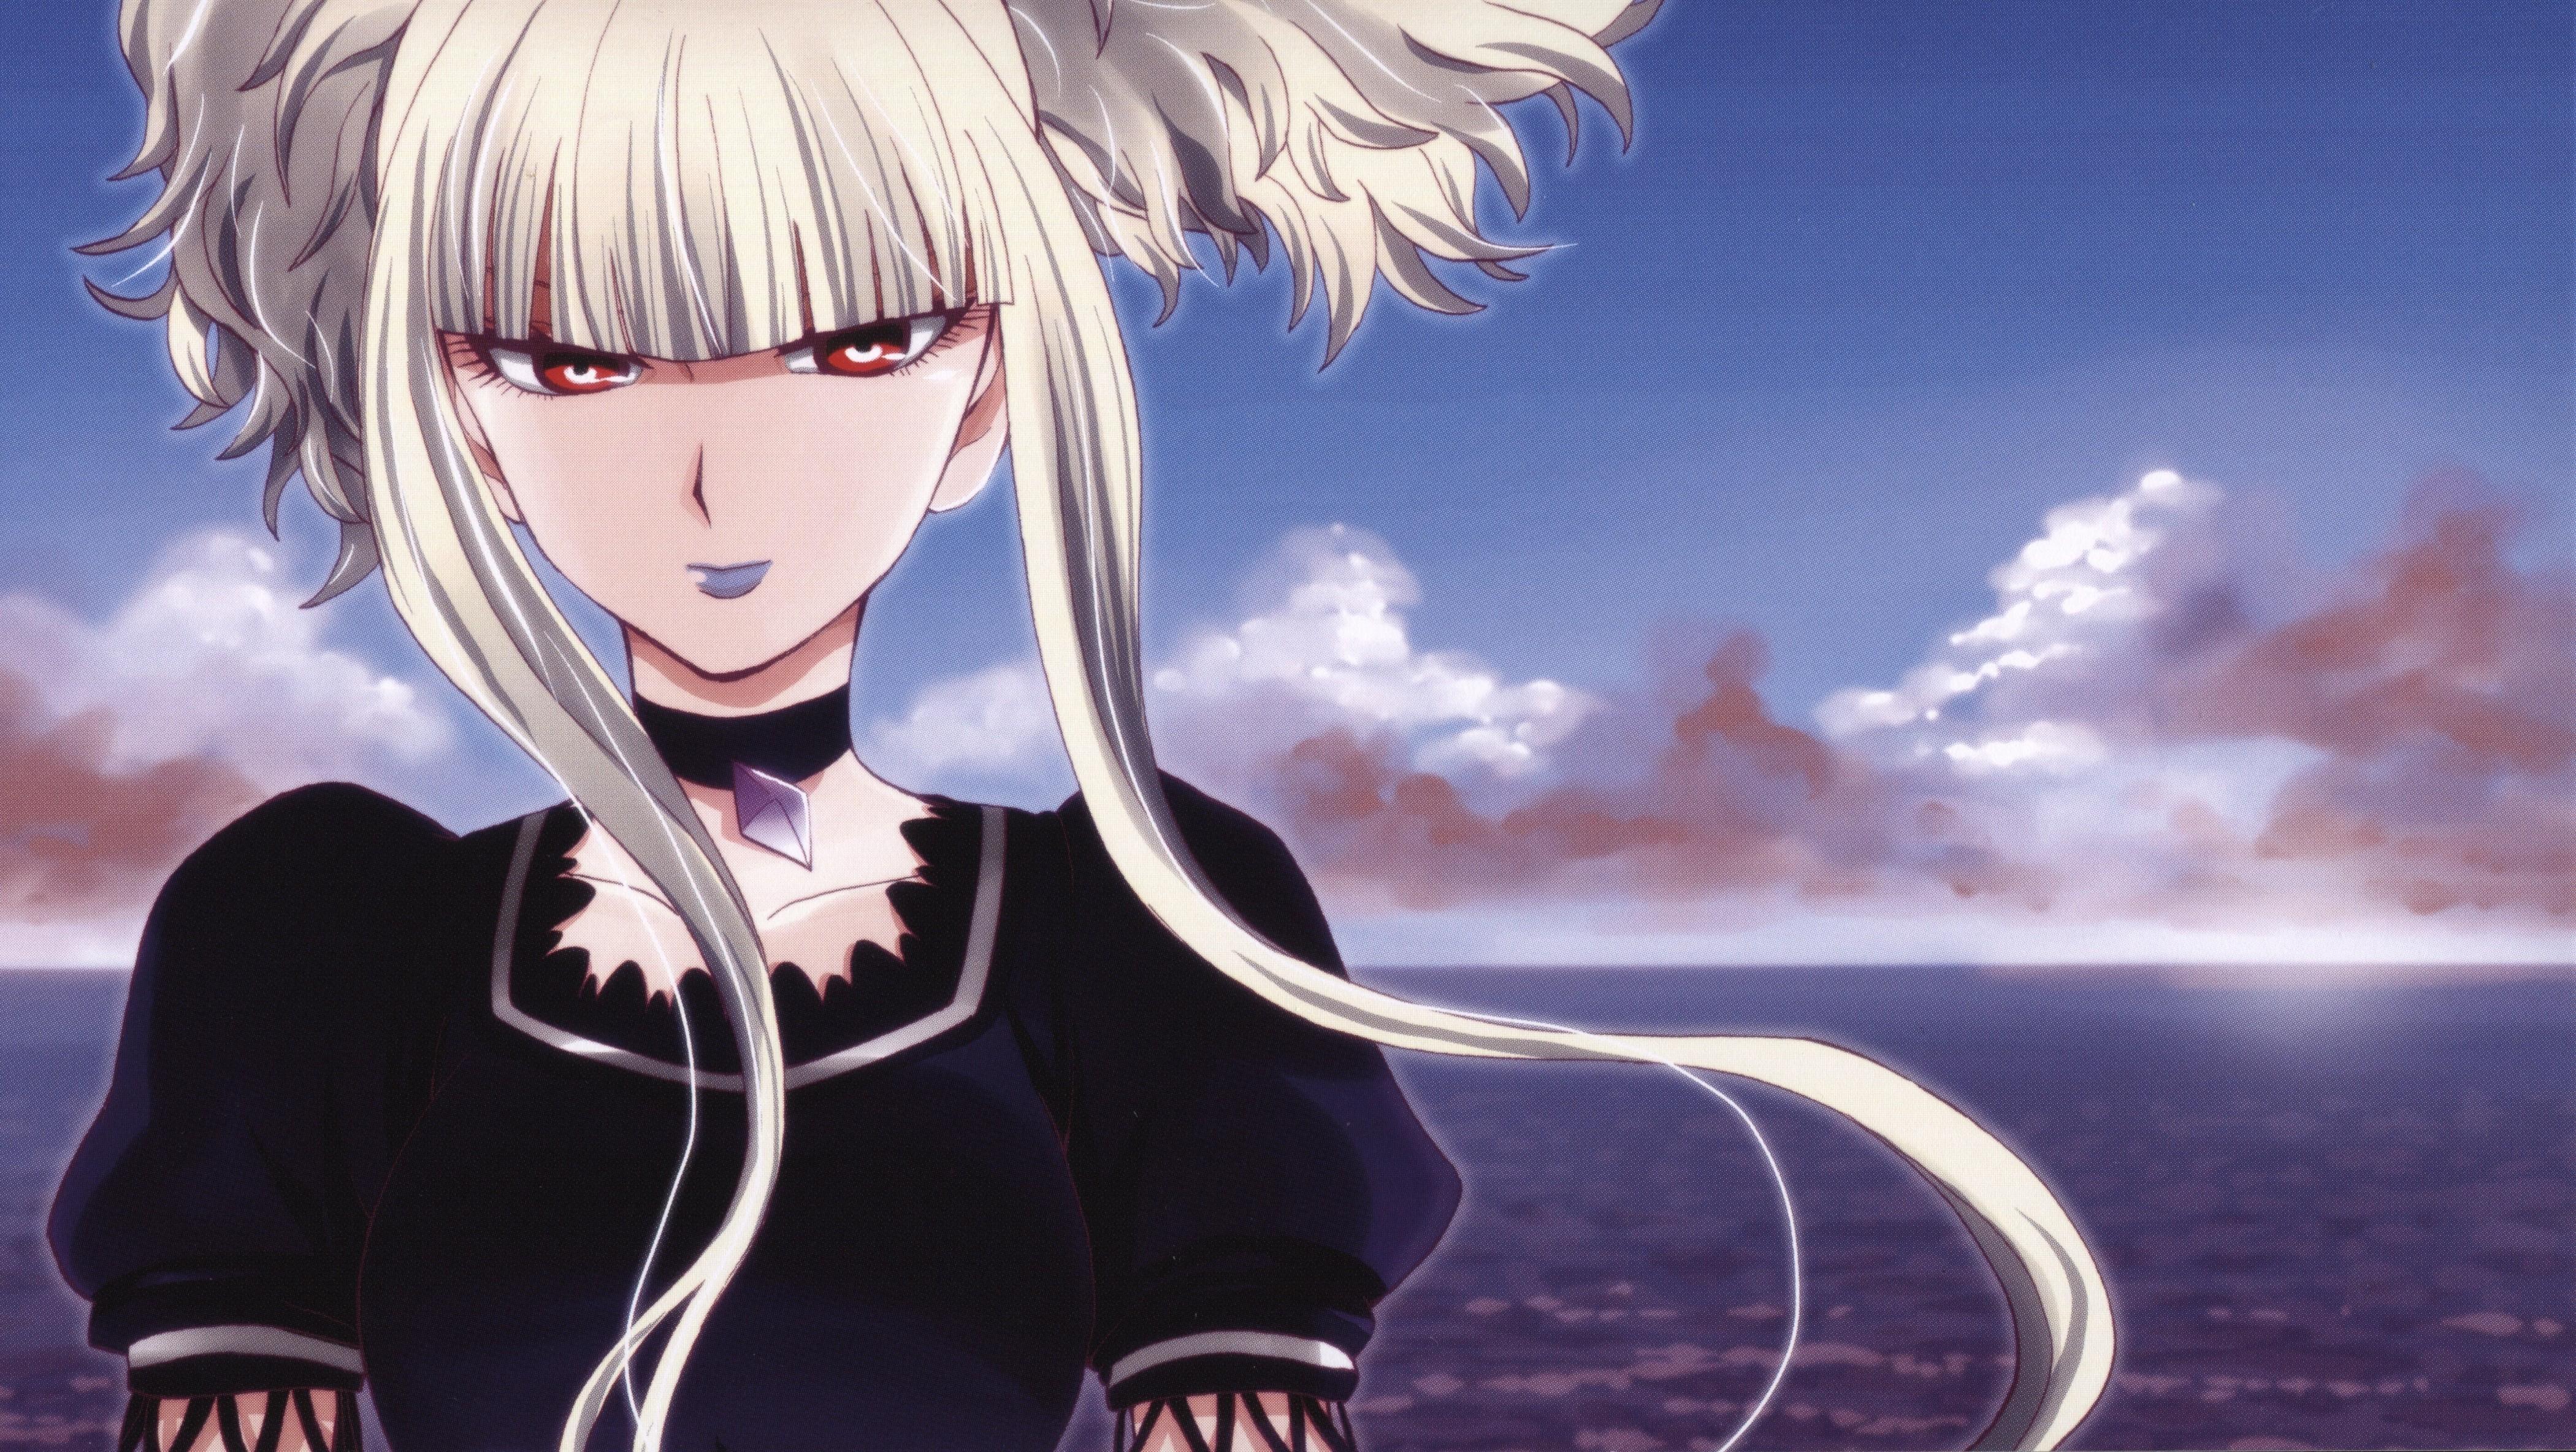 Anime 4201x2368 Aoki Hagane no Arpeggio Kongou (Aoki Hagane no Arpeggio) long hair blonde twintails sea red eyes collar